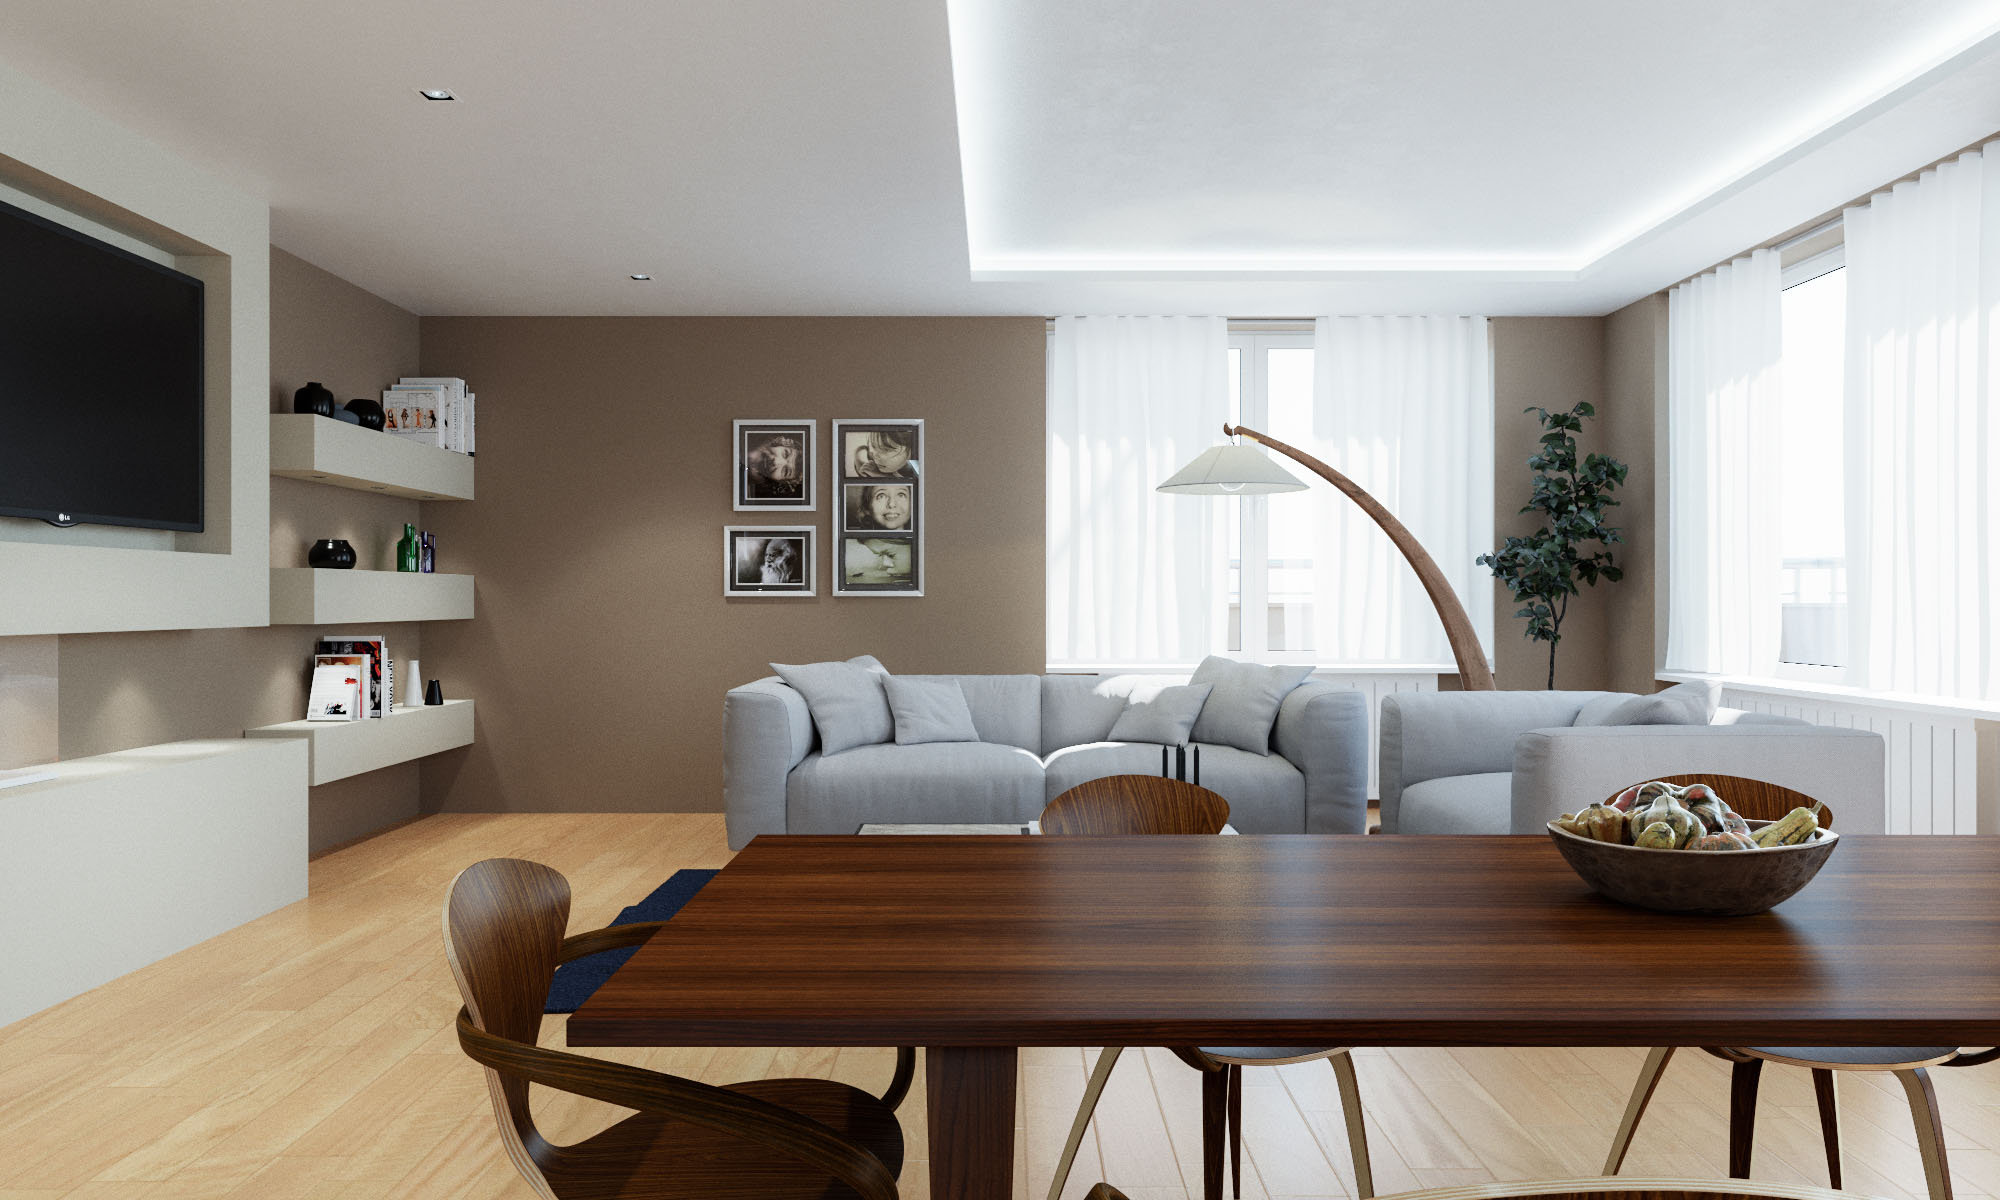 Render 3D arquitectura dúplex Donostia detalle salón comedor 1